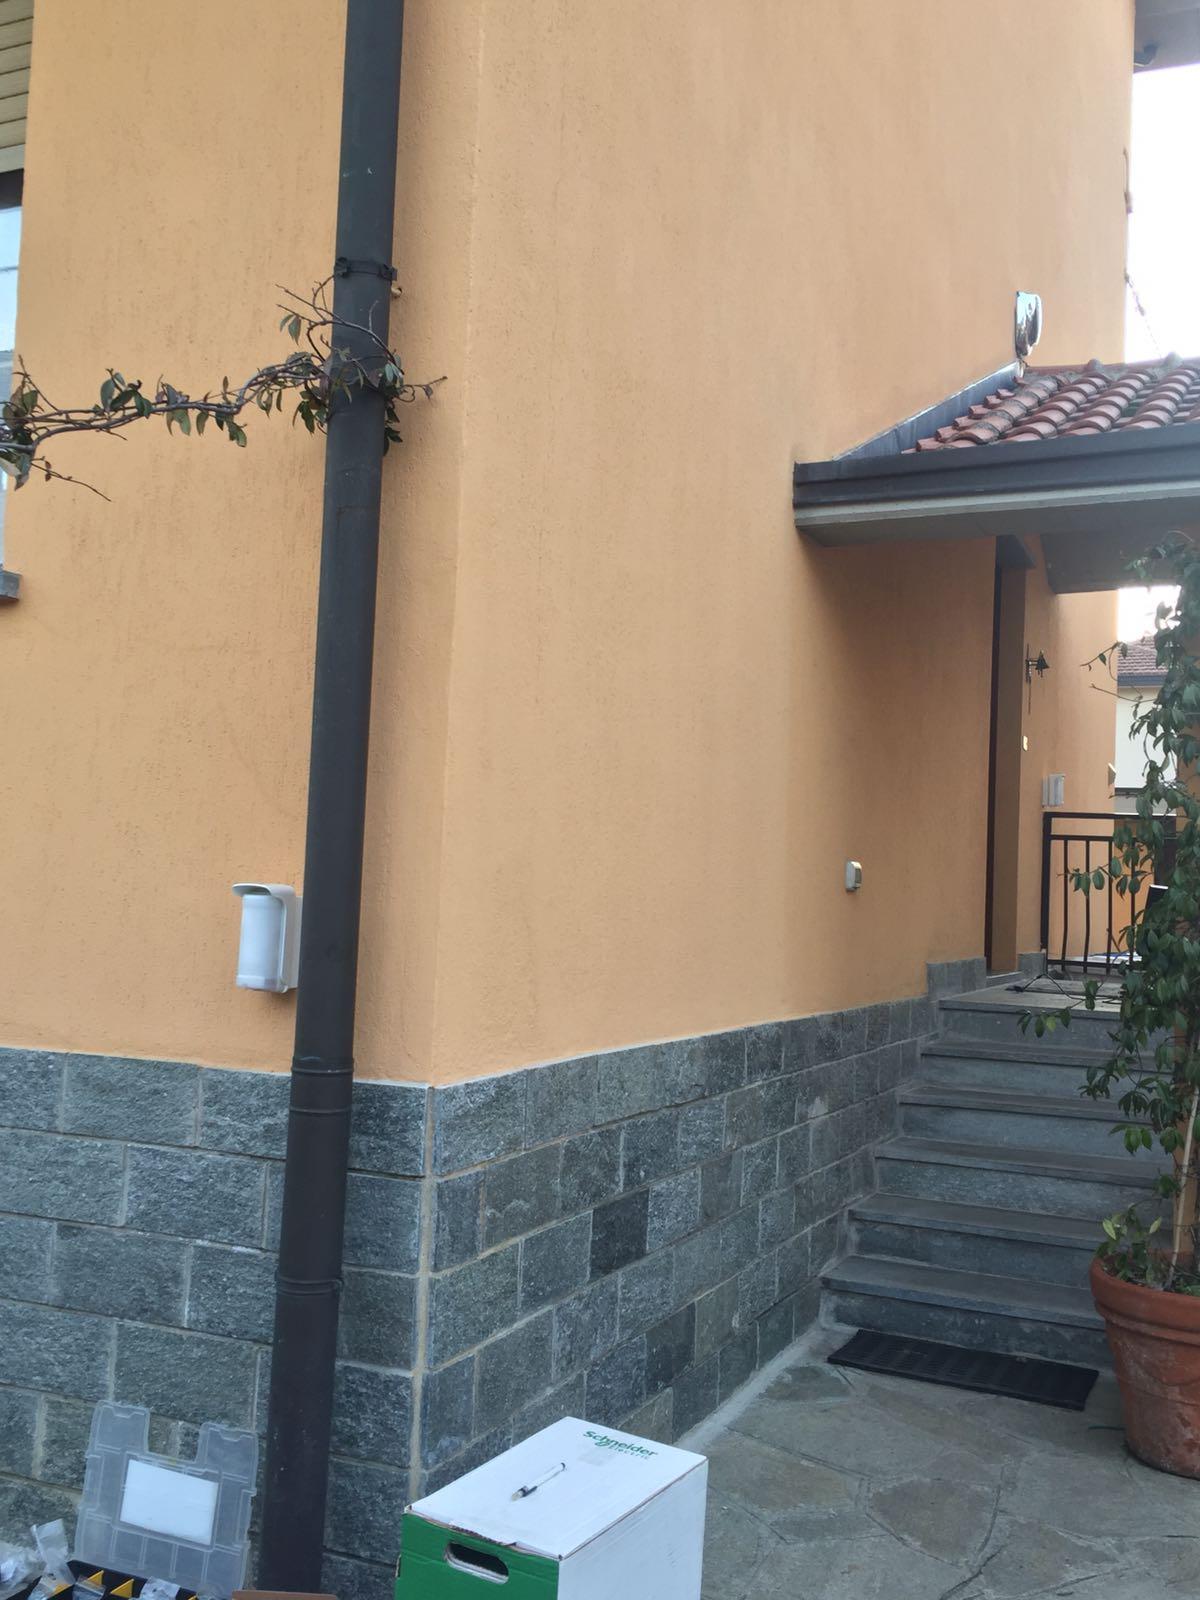 GlobalTec,Antifurti,Antifurti Torino,Videosorveglianza,Sicurezza,Sicurezza Torino,Security,Antincendio,Domotica,Domotica Torino,Torino